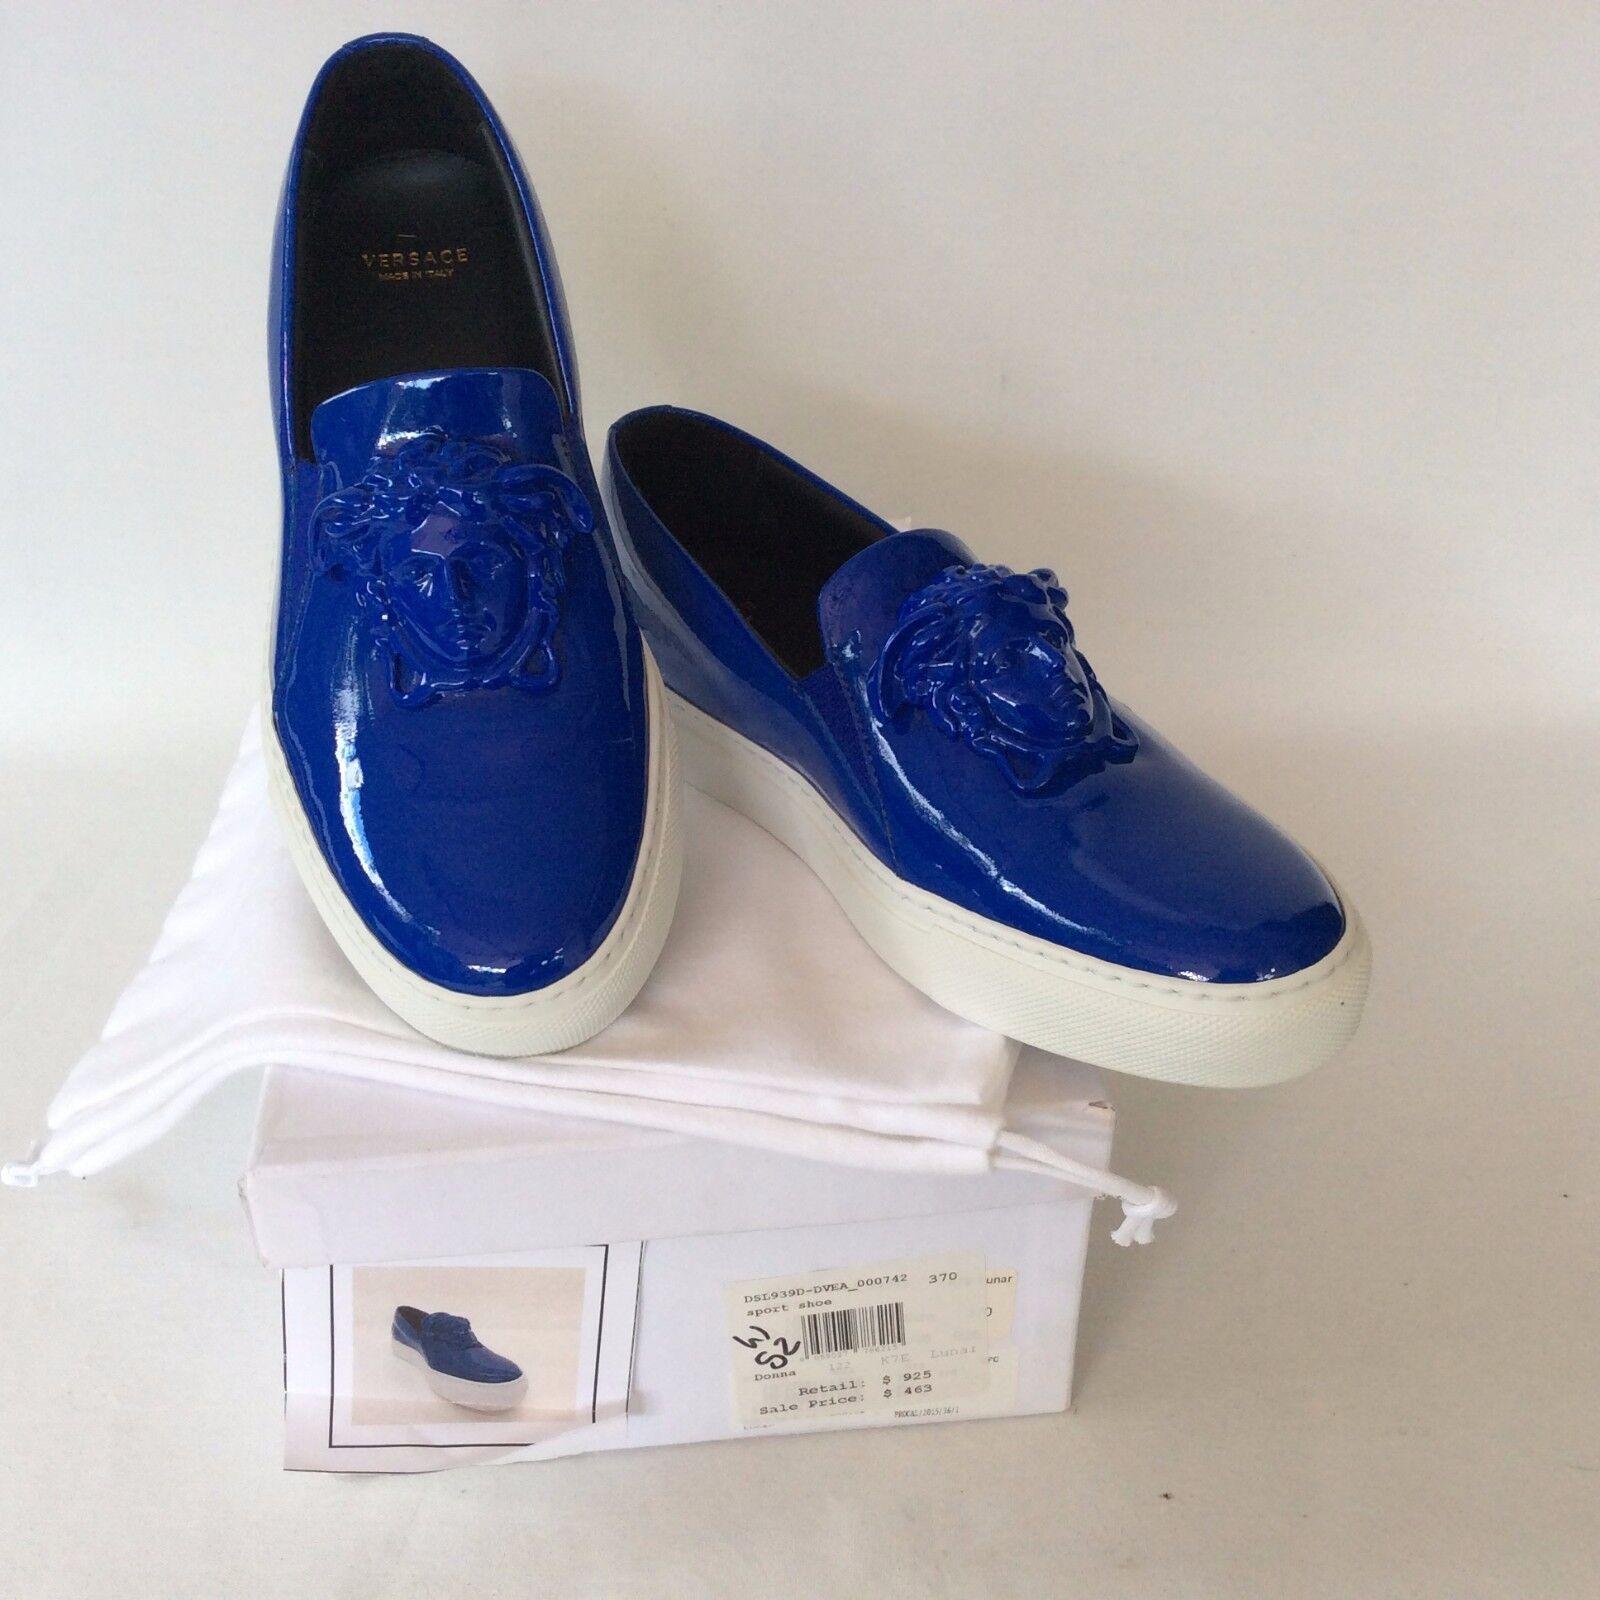 VERSACE Palazzo Medusa Slip On Sneakers Patent Leather bluee Size 37 US 7.5 NIB